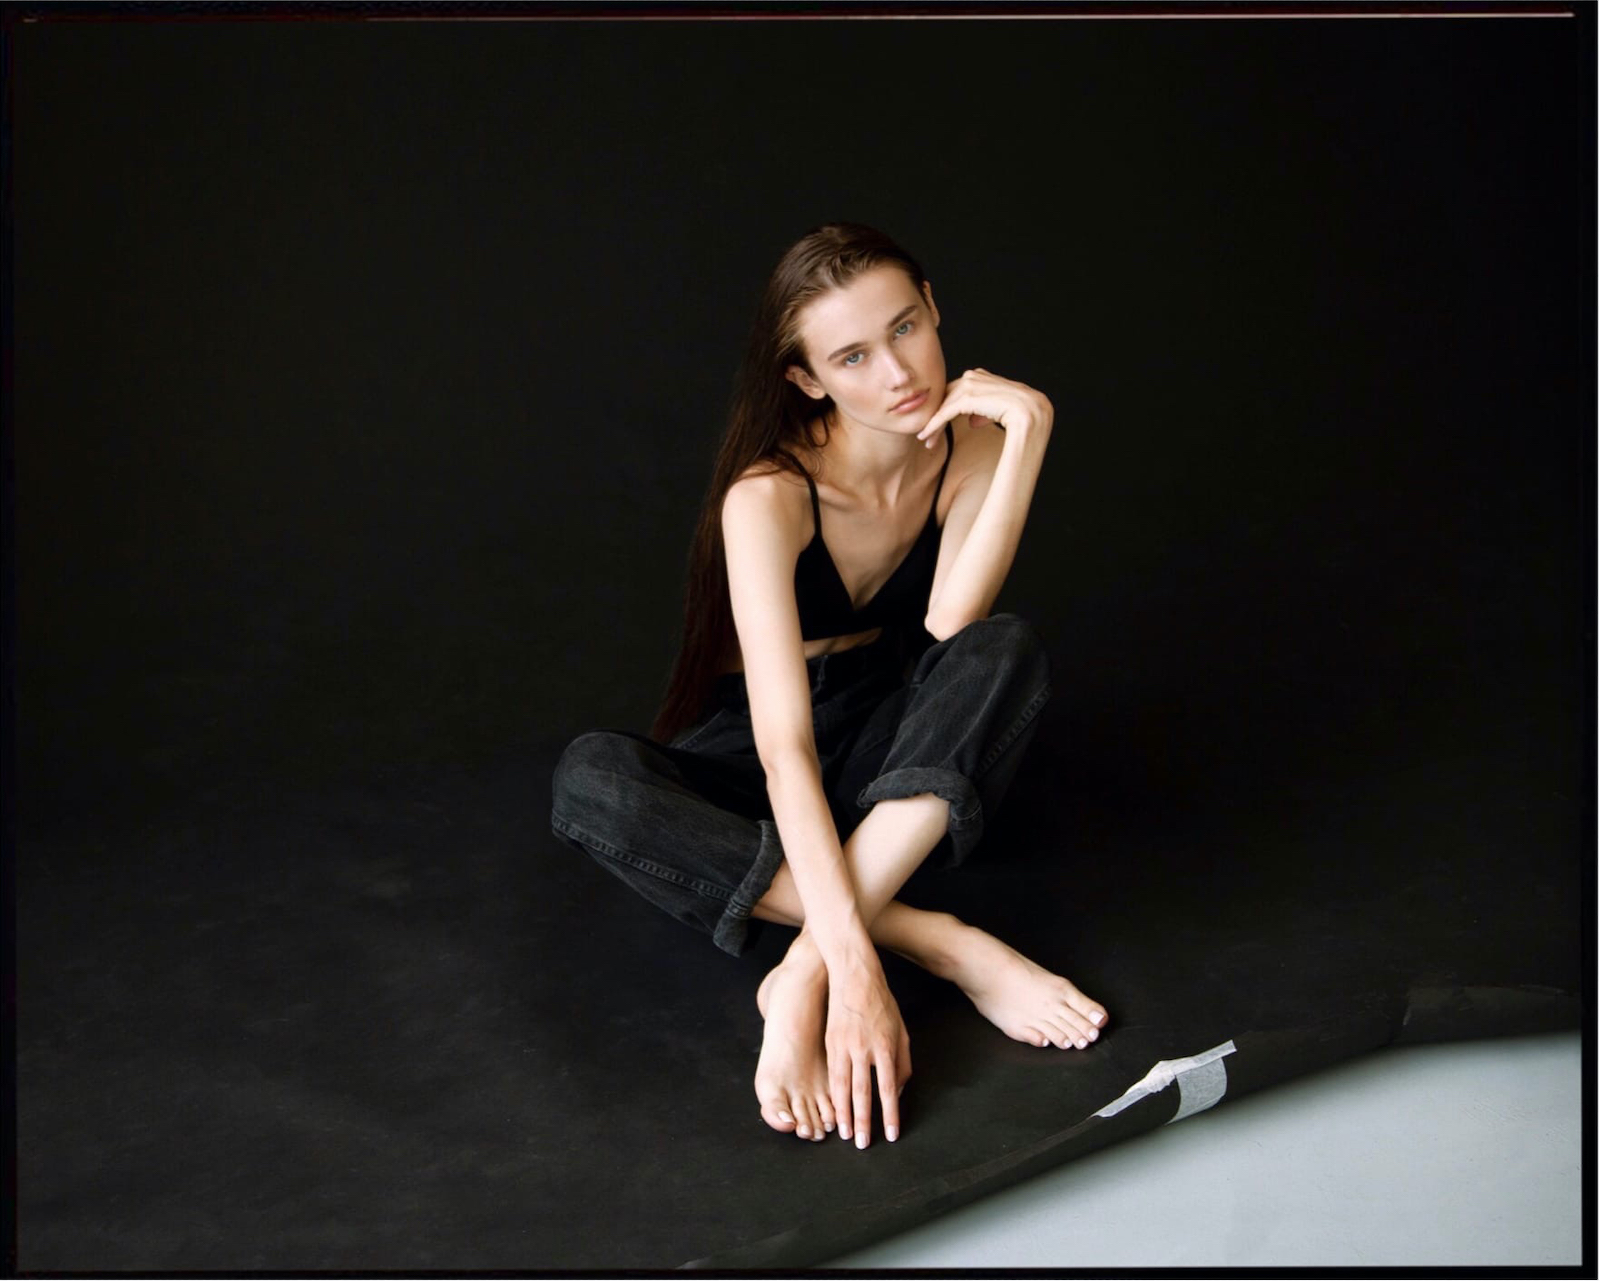 Nataly by Daria Boytsova